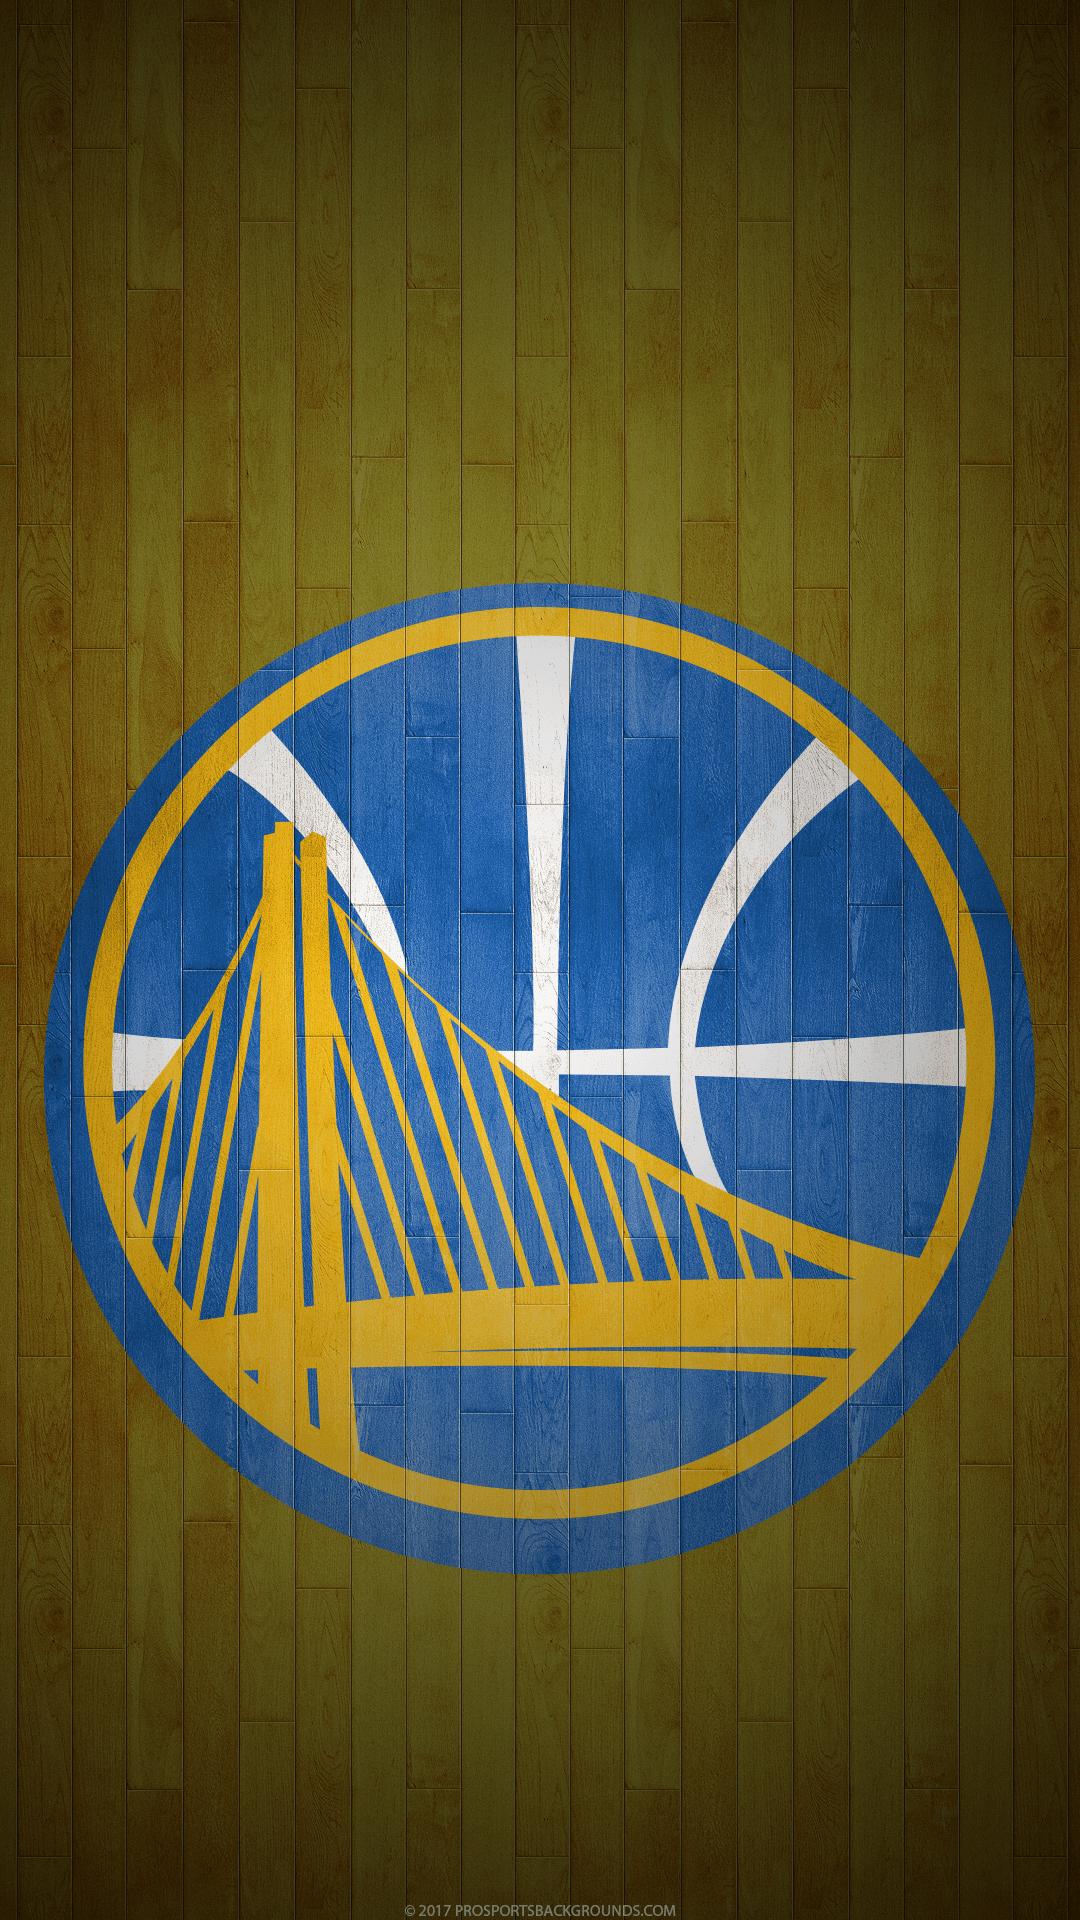 2018 Golden State Warriors Wallpapers